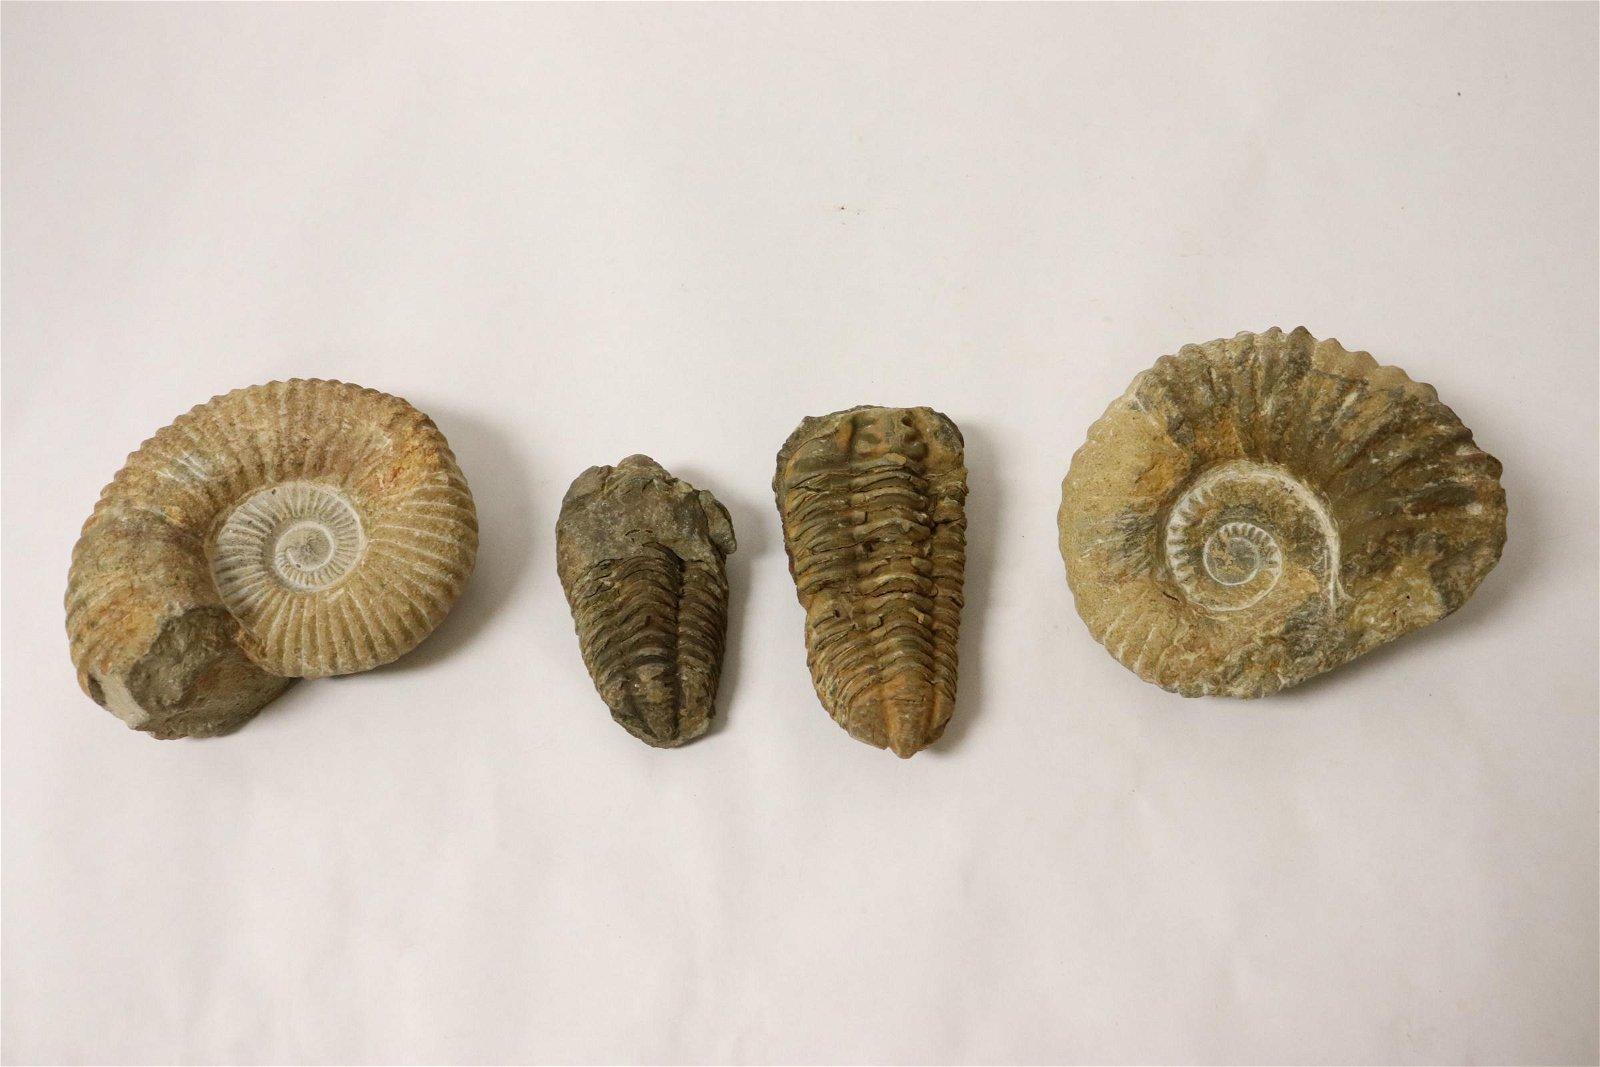 4 fossil stones